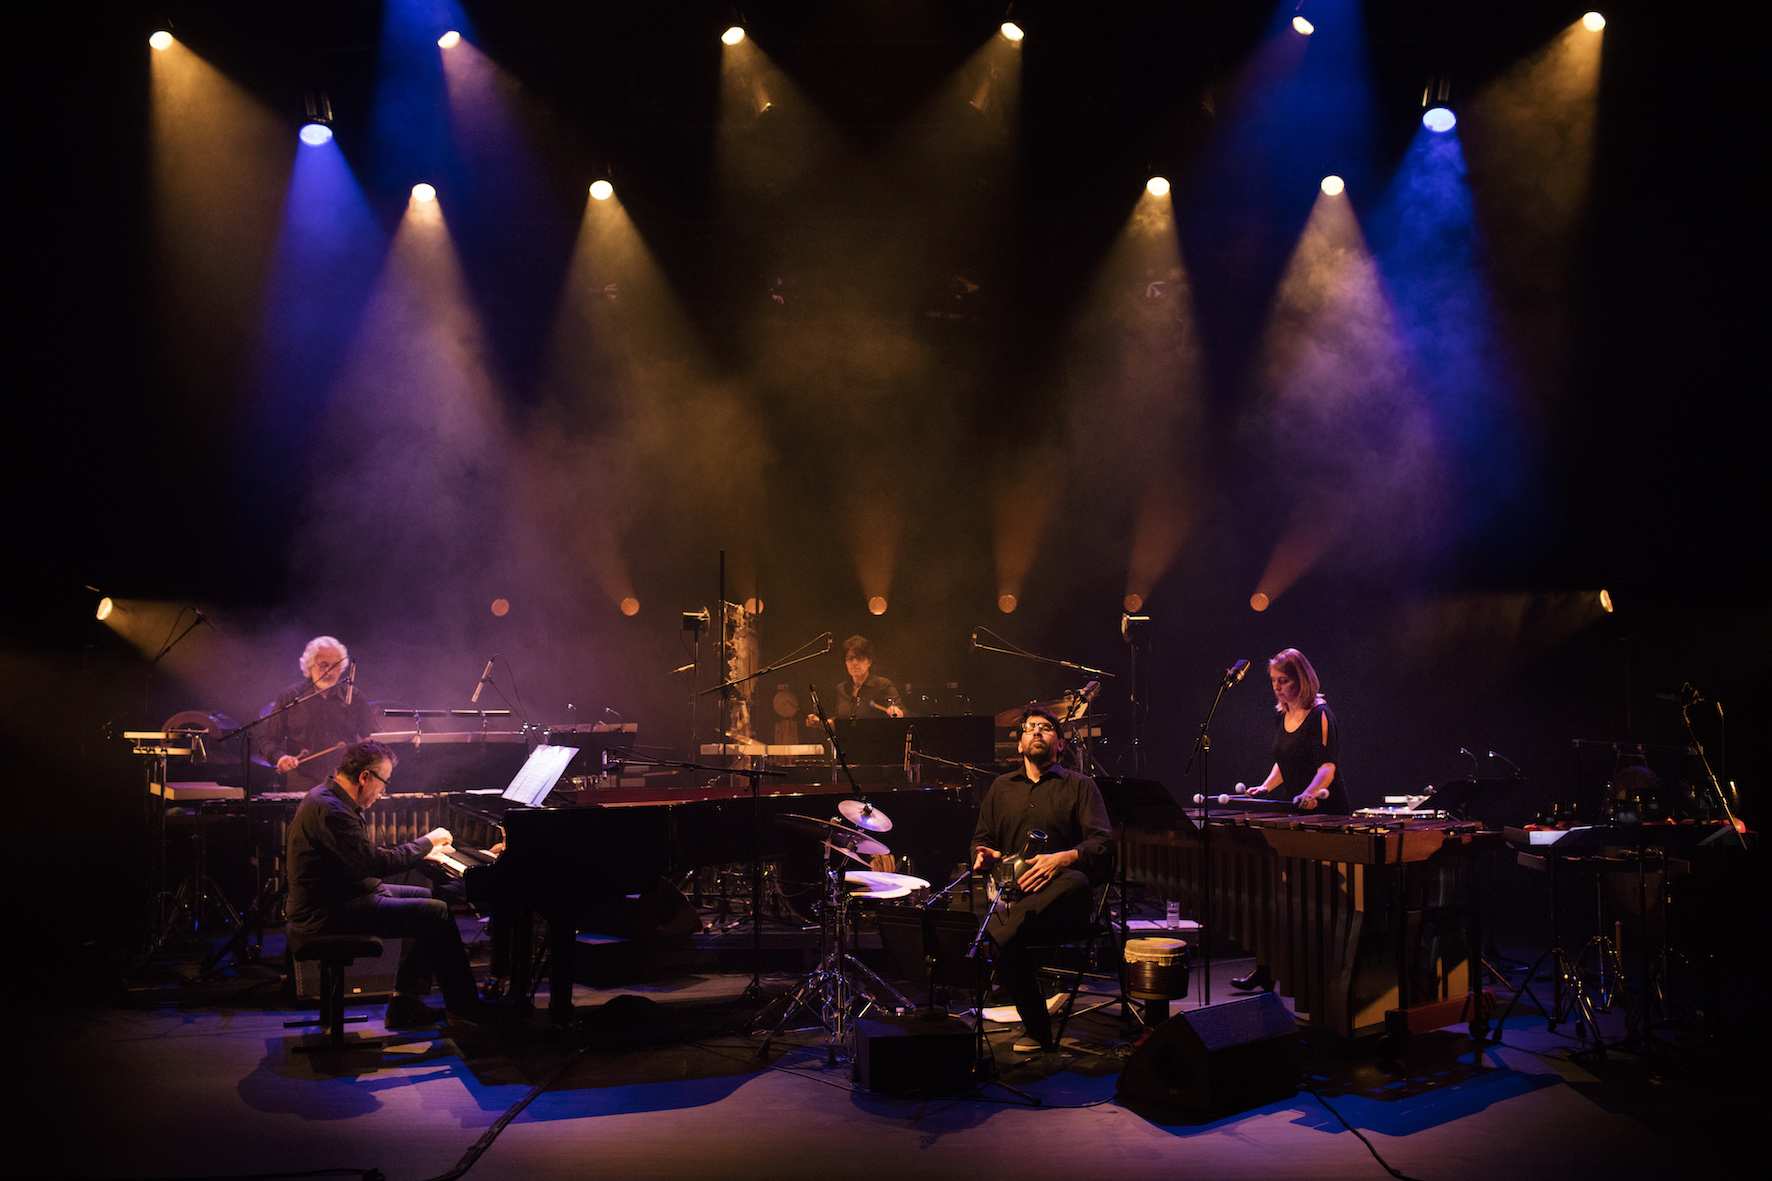 Jean-Marie Machado «Impulse Songs» - Critique sortie Jazz / Musiques 75020 Paris Studio de l'Ermitage